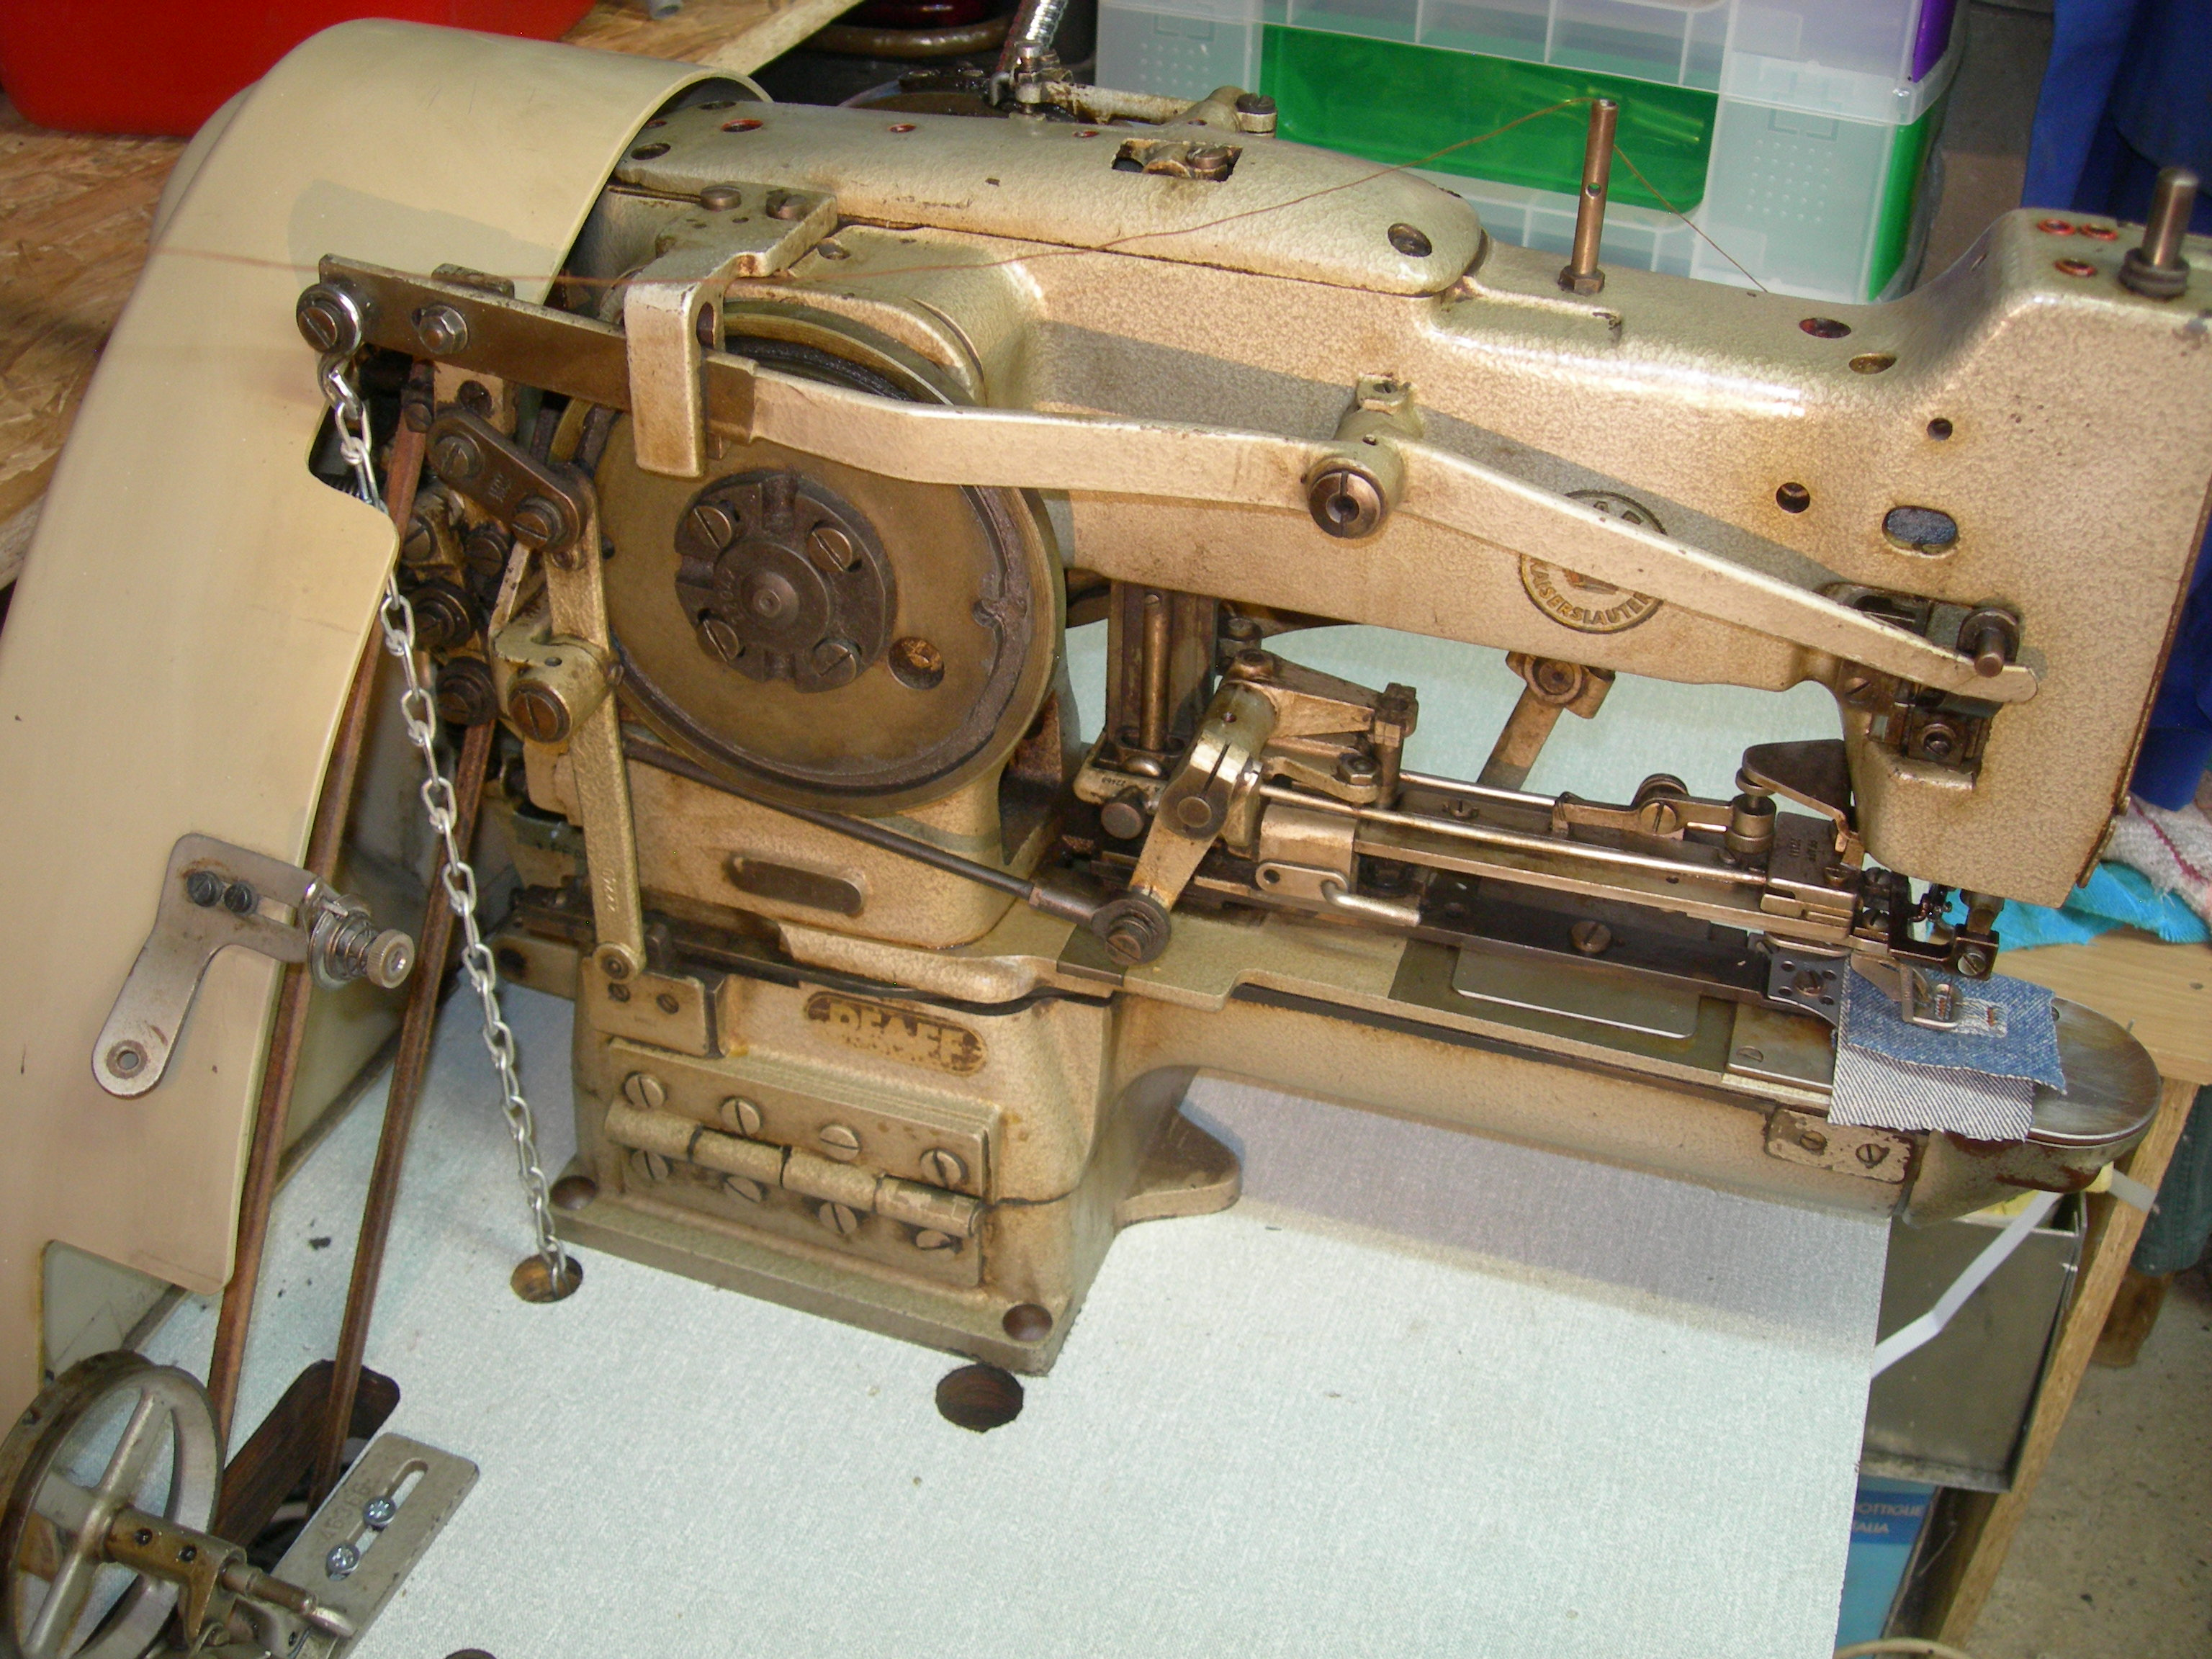 bar tack sewing machine